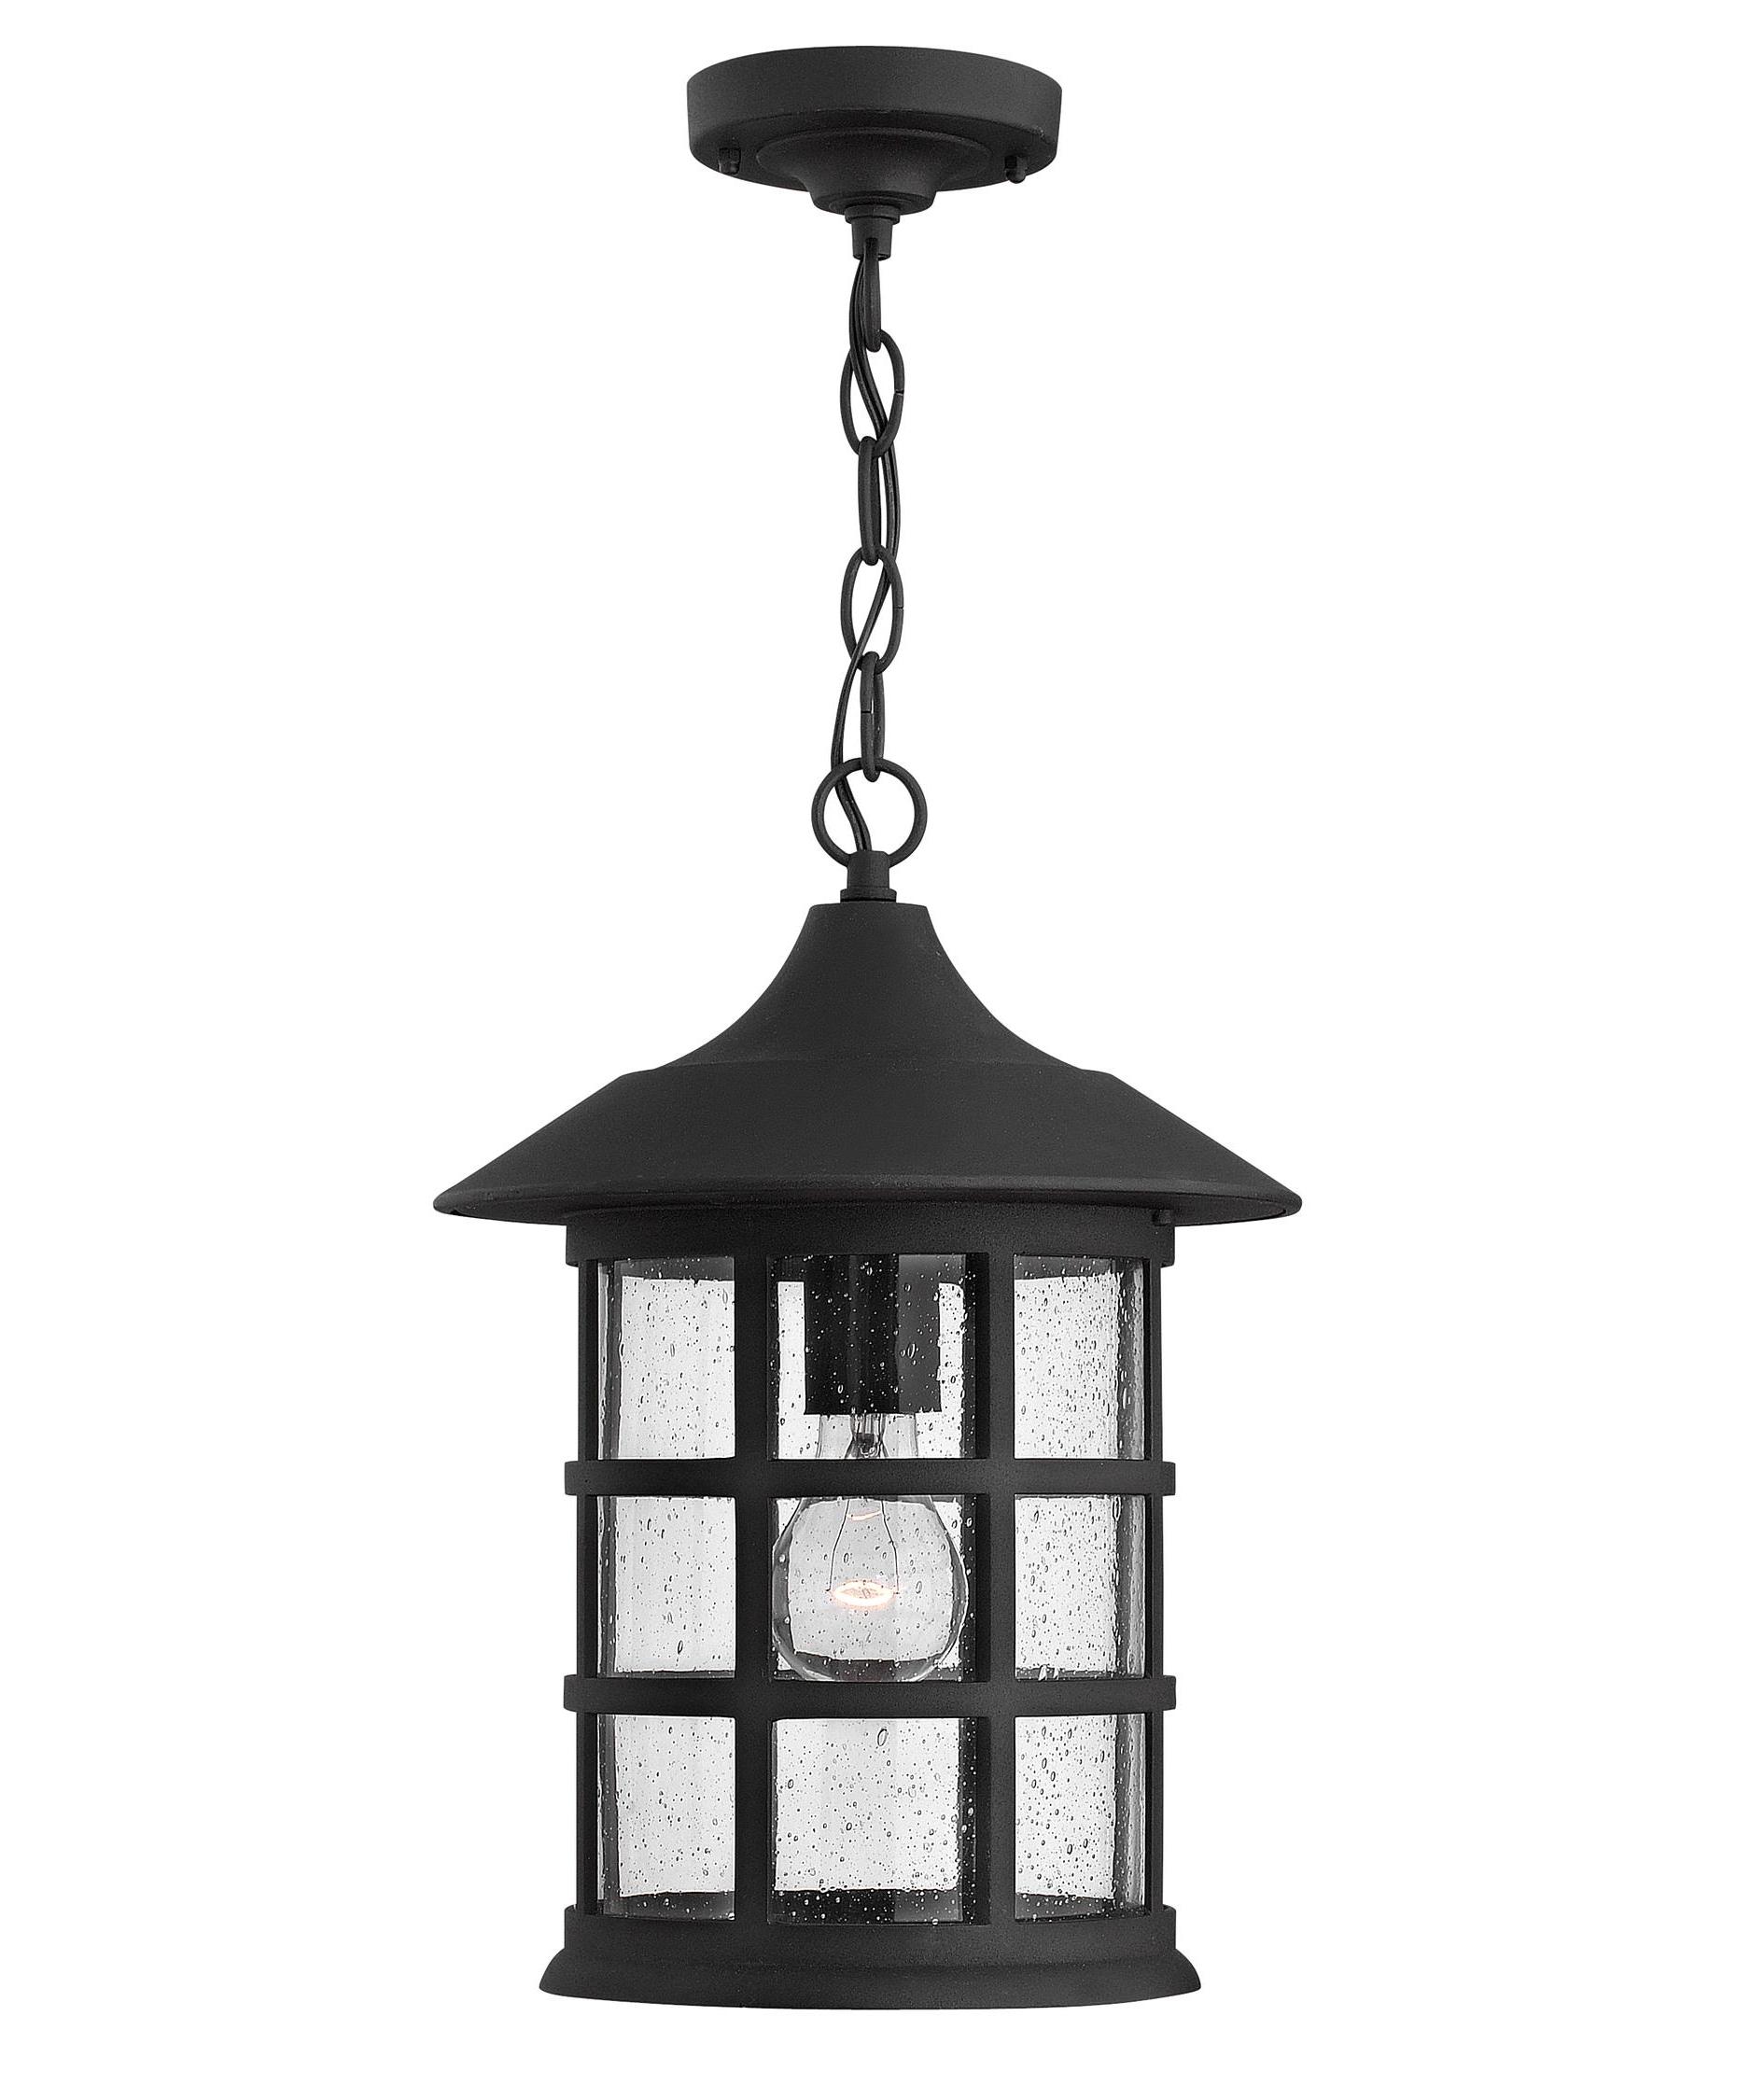 Most Popular Hinkley Lighting 1802 Freeport 10 Inch Wide 1 Light Outdoor Hanging In Hinkley Outdoor Ceiling Lights (View 17 of 20)